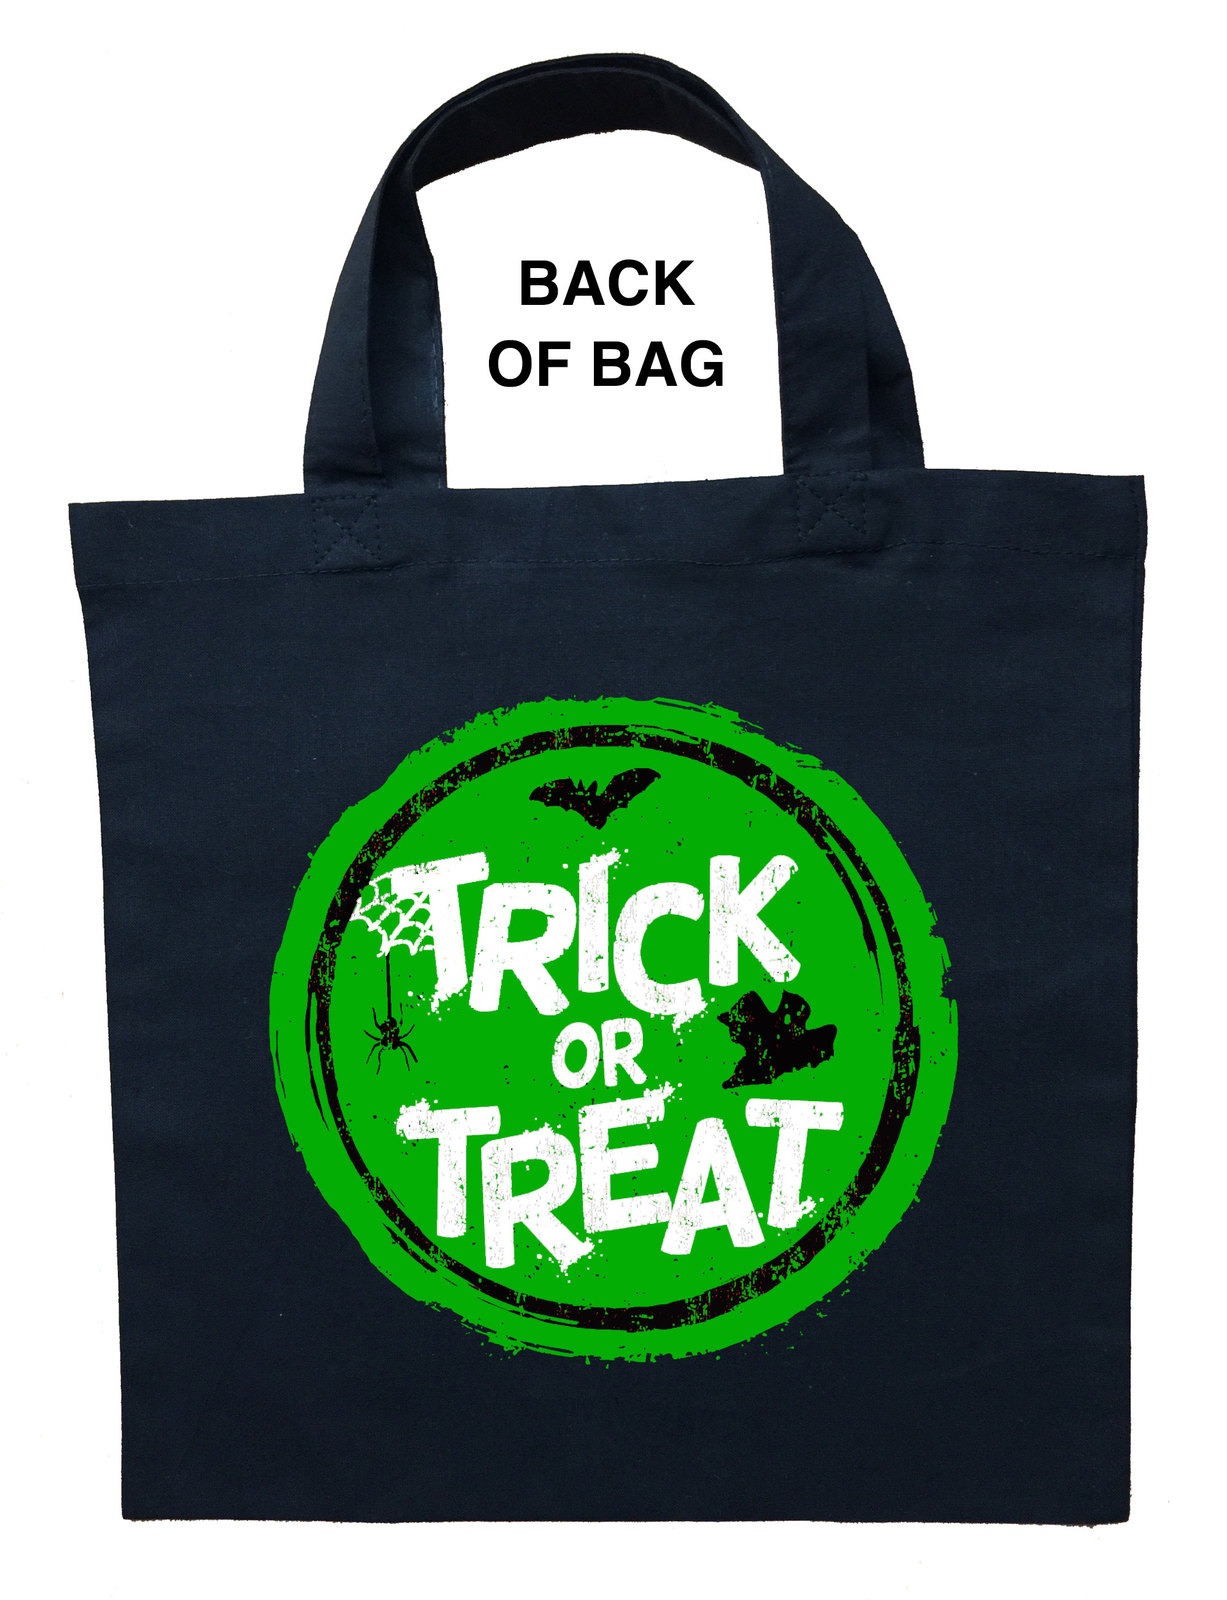 Joker Trick or Treat Bag - Personalized Joker Halloween Bag image 2